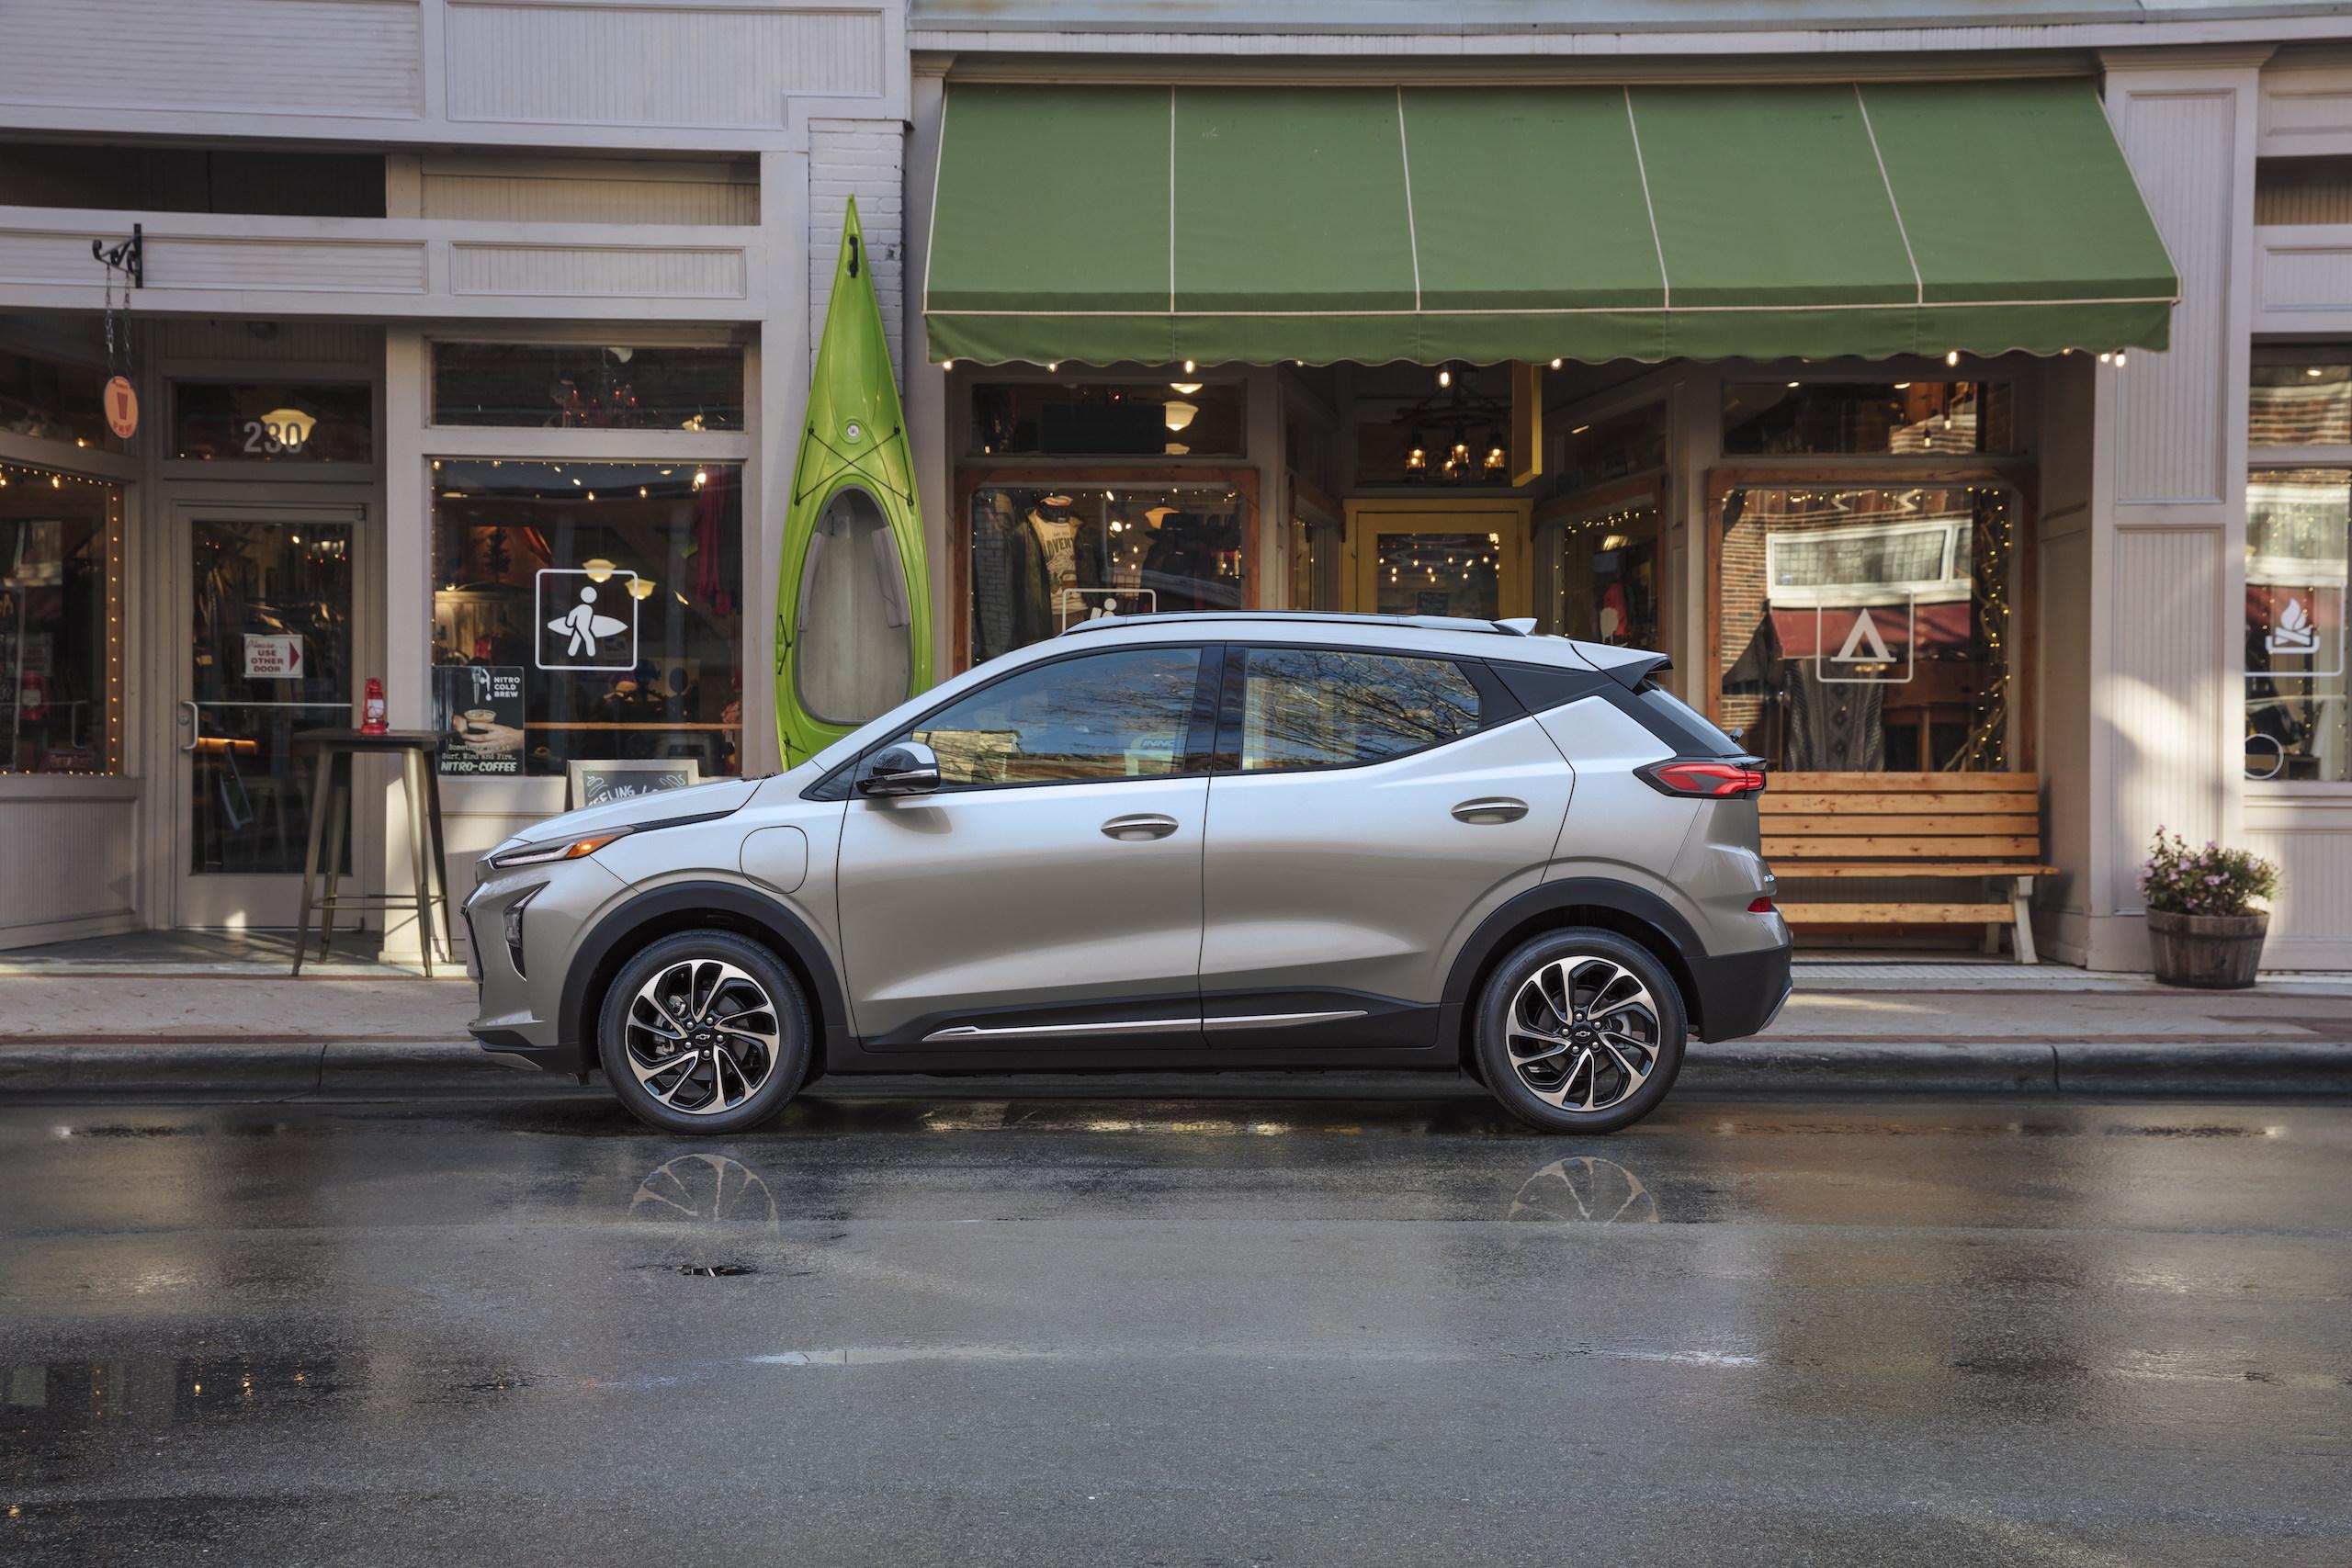 2022 Chevrolet Bolt EUV side profile